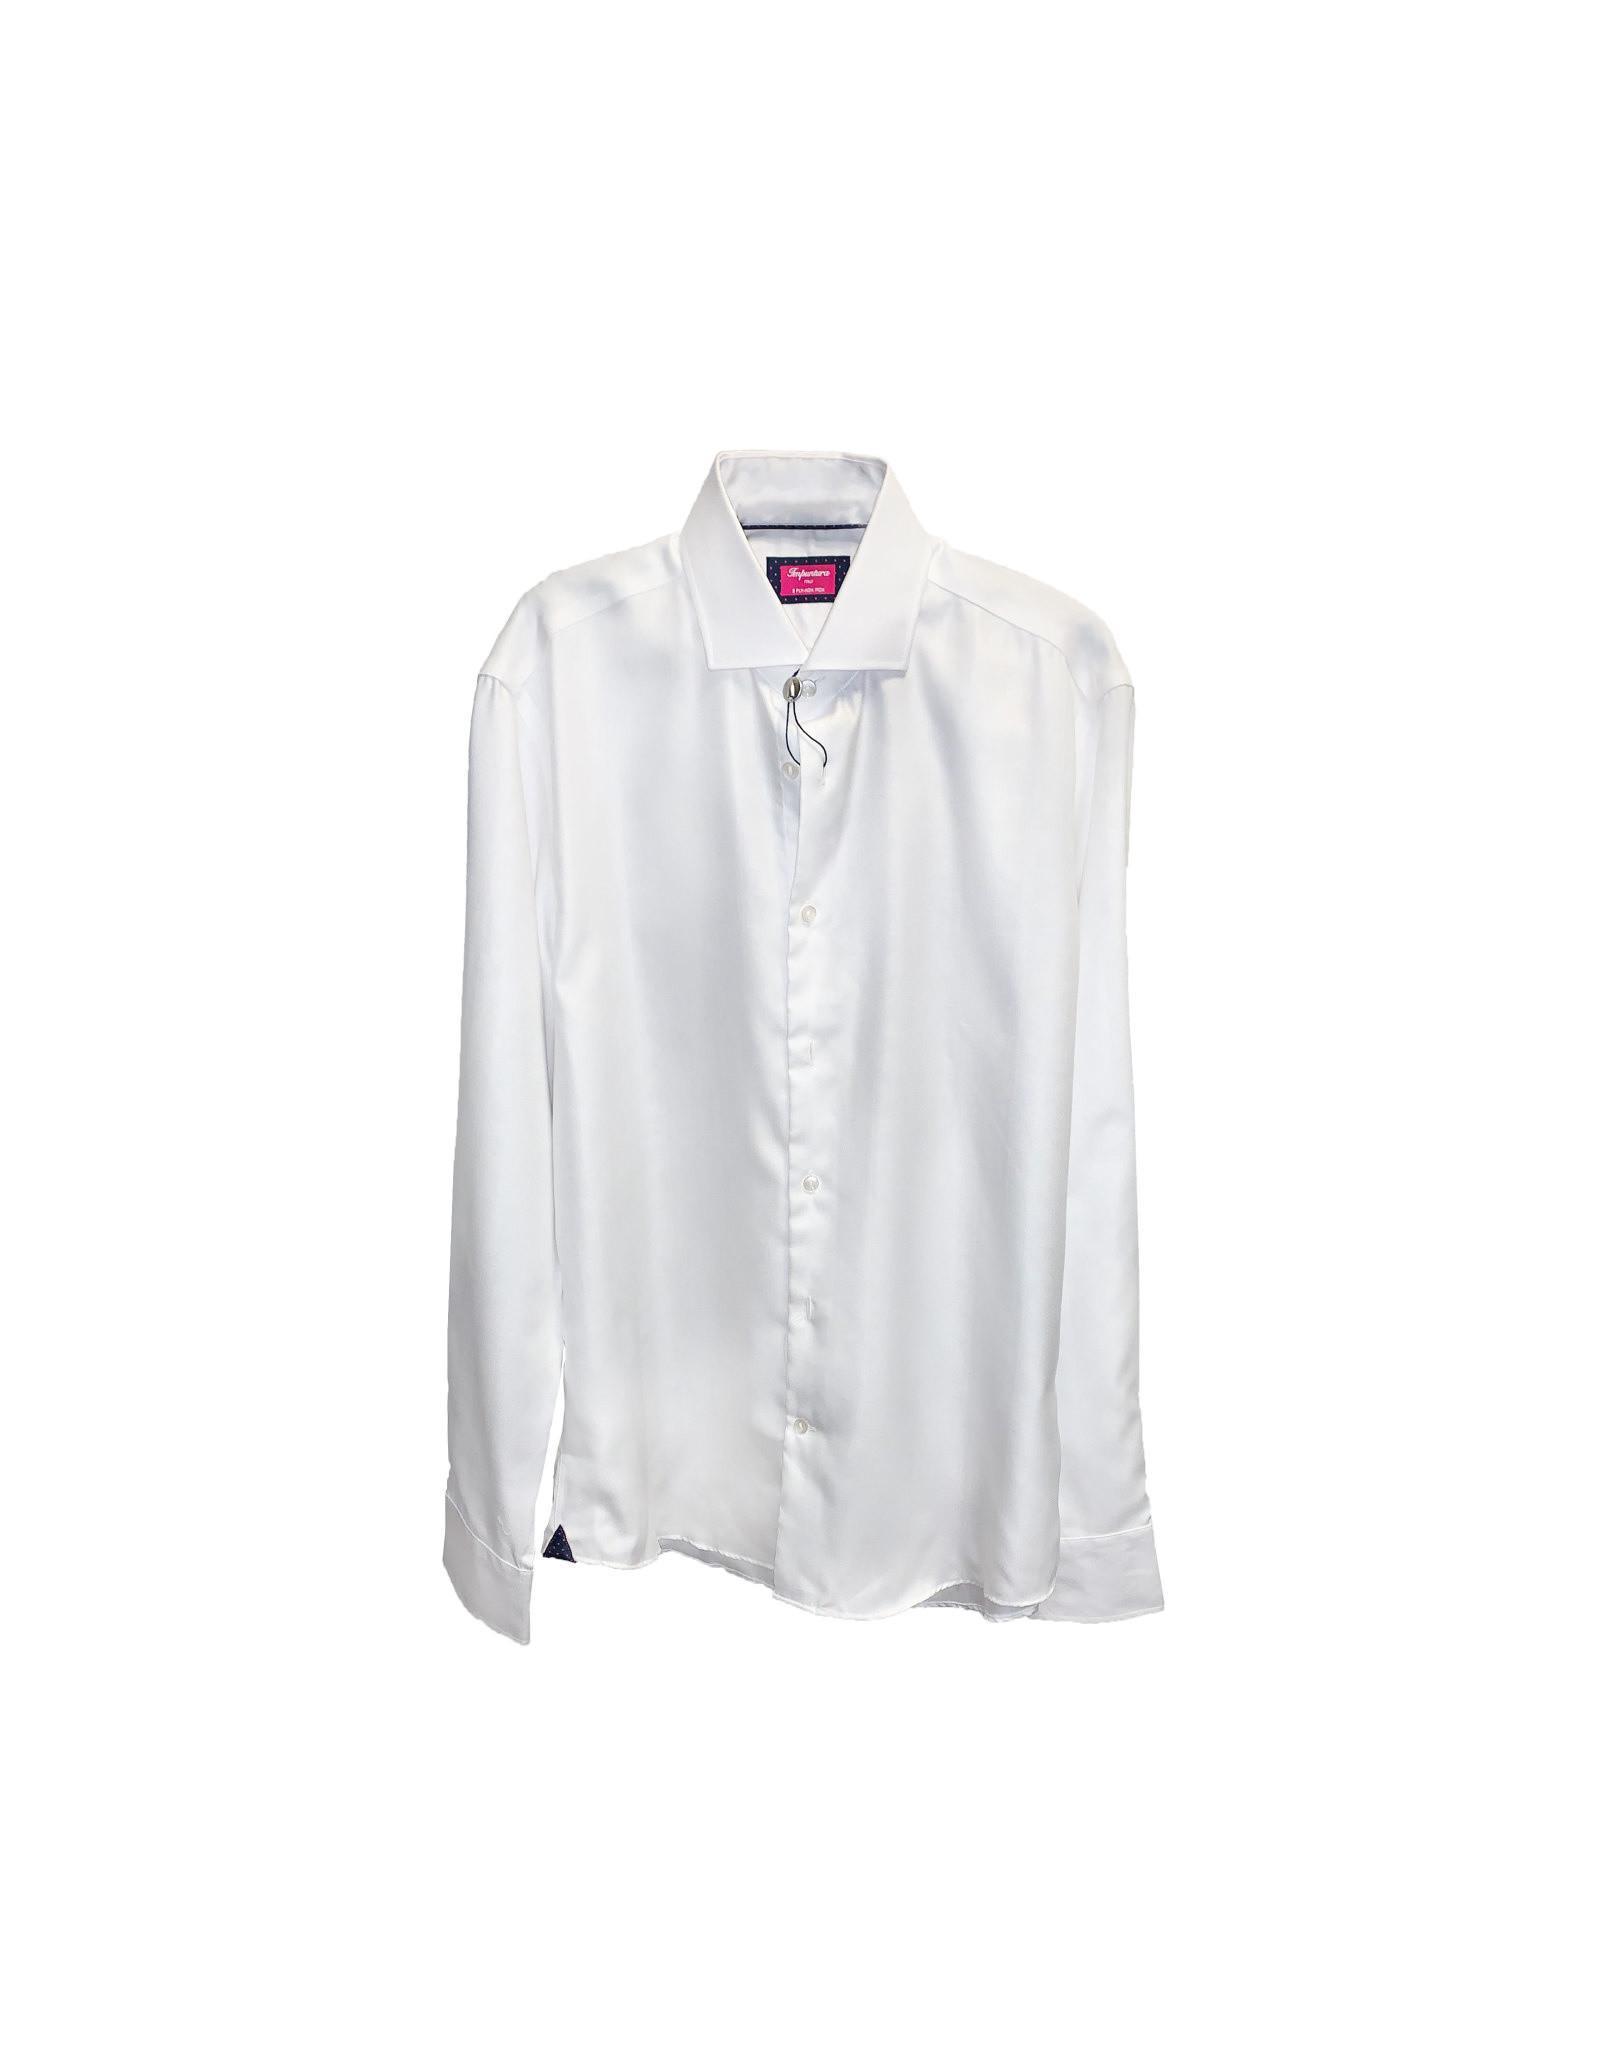 IMPUNTURA Impuntura Slim Fit Shirt Size: 16/36